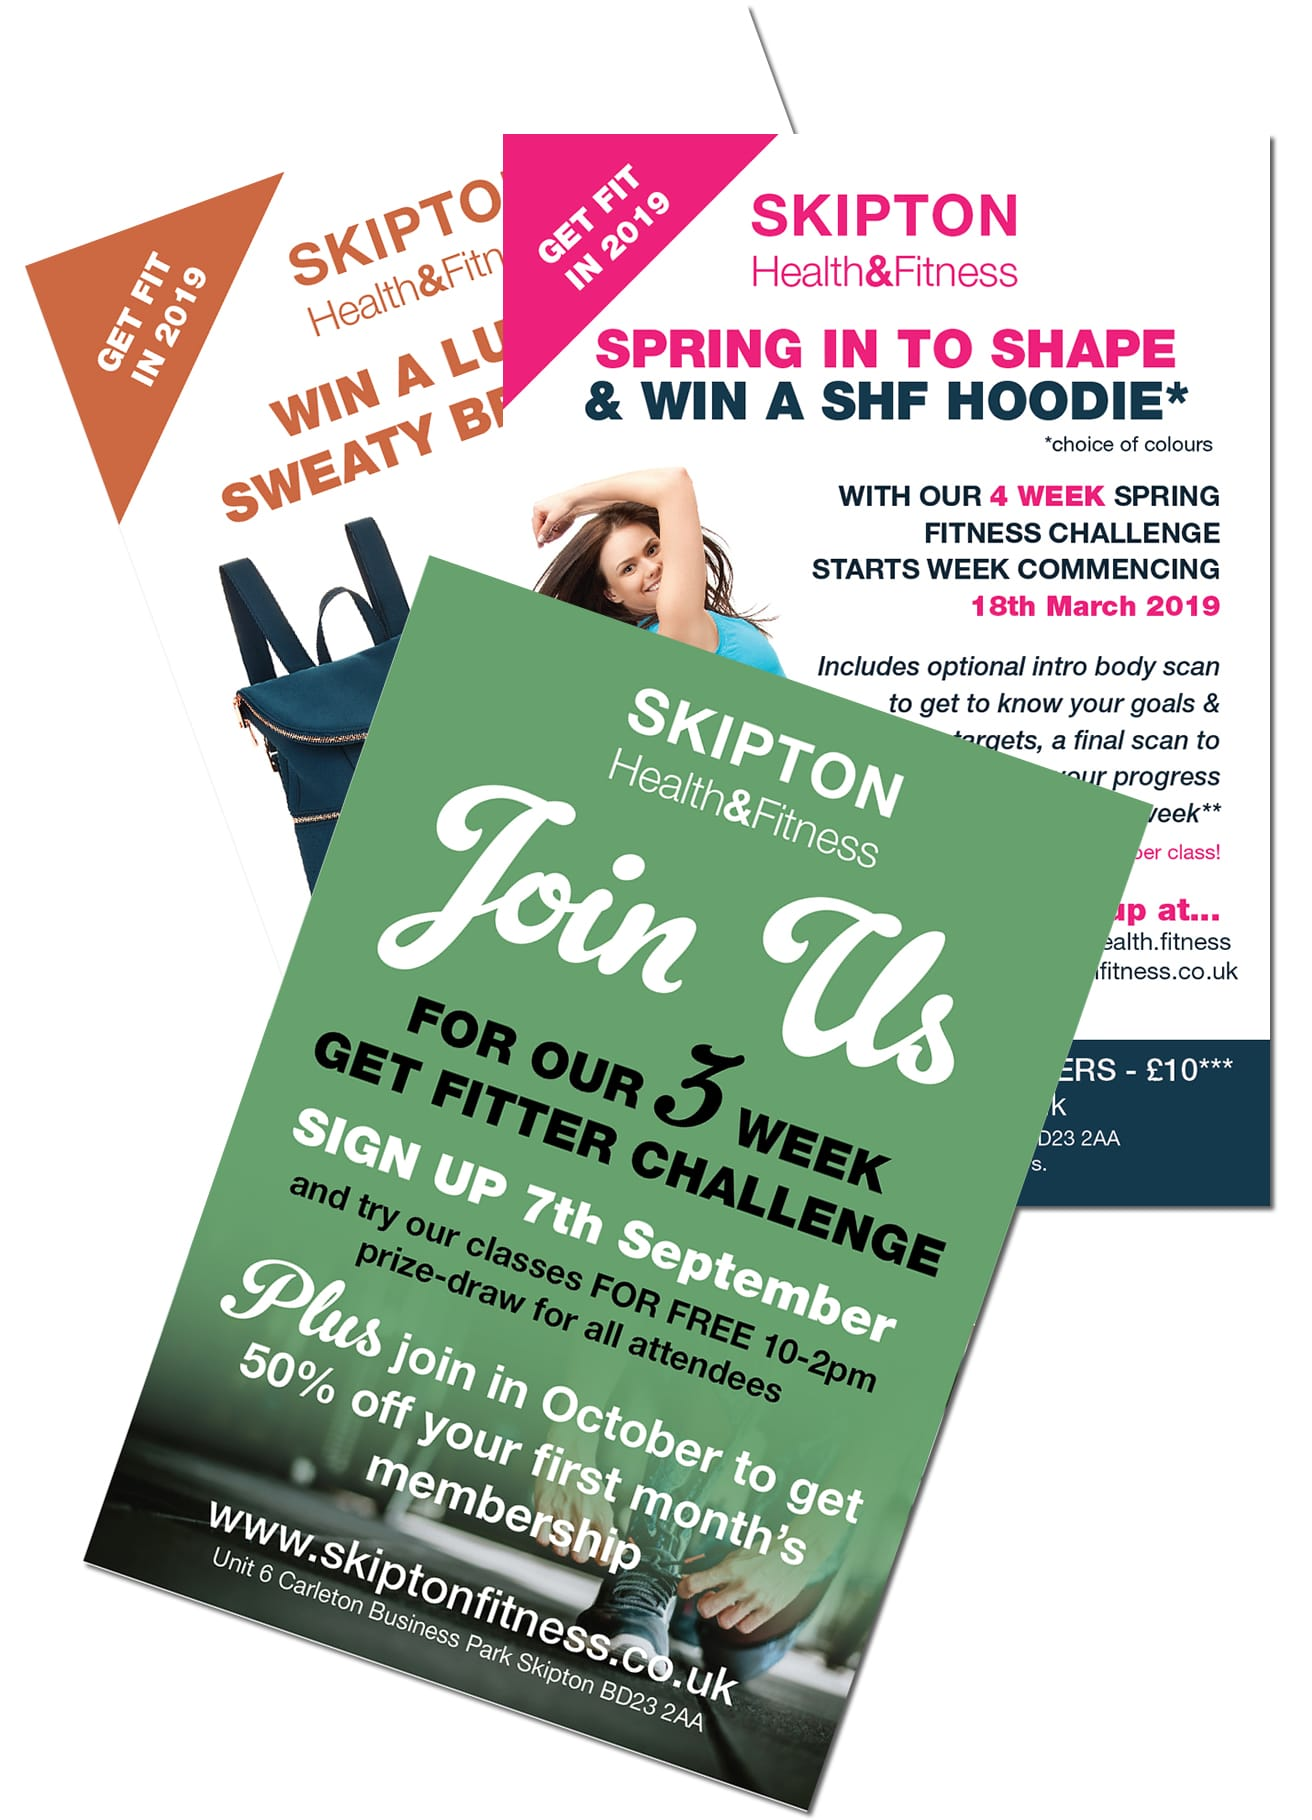 skipton fitness leaflet design